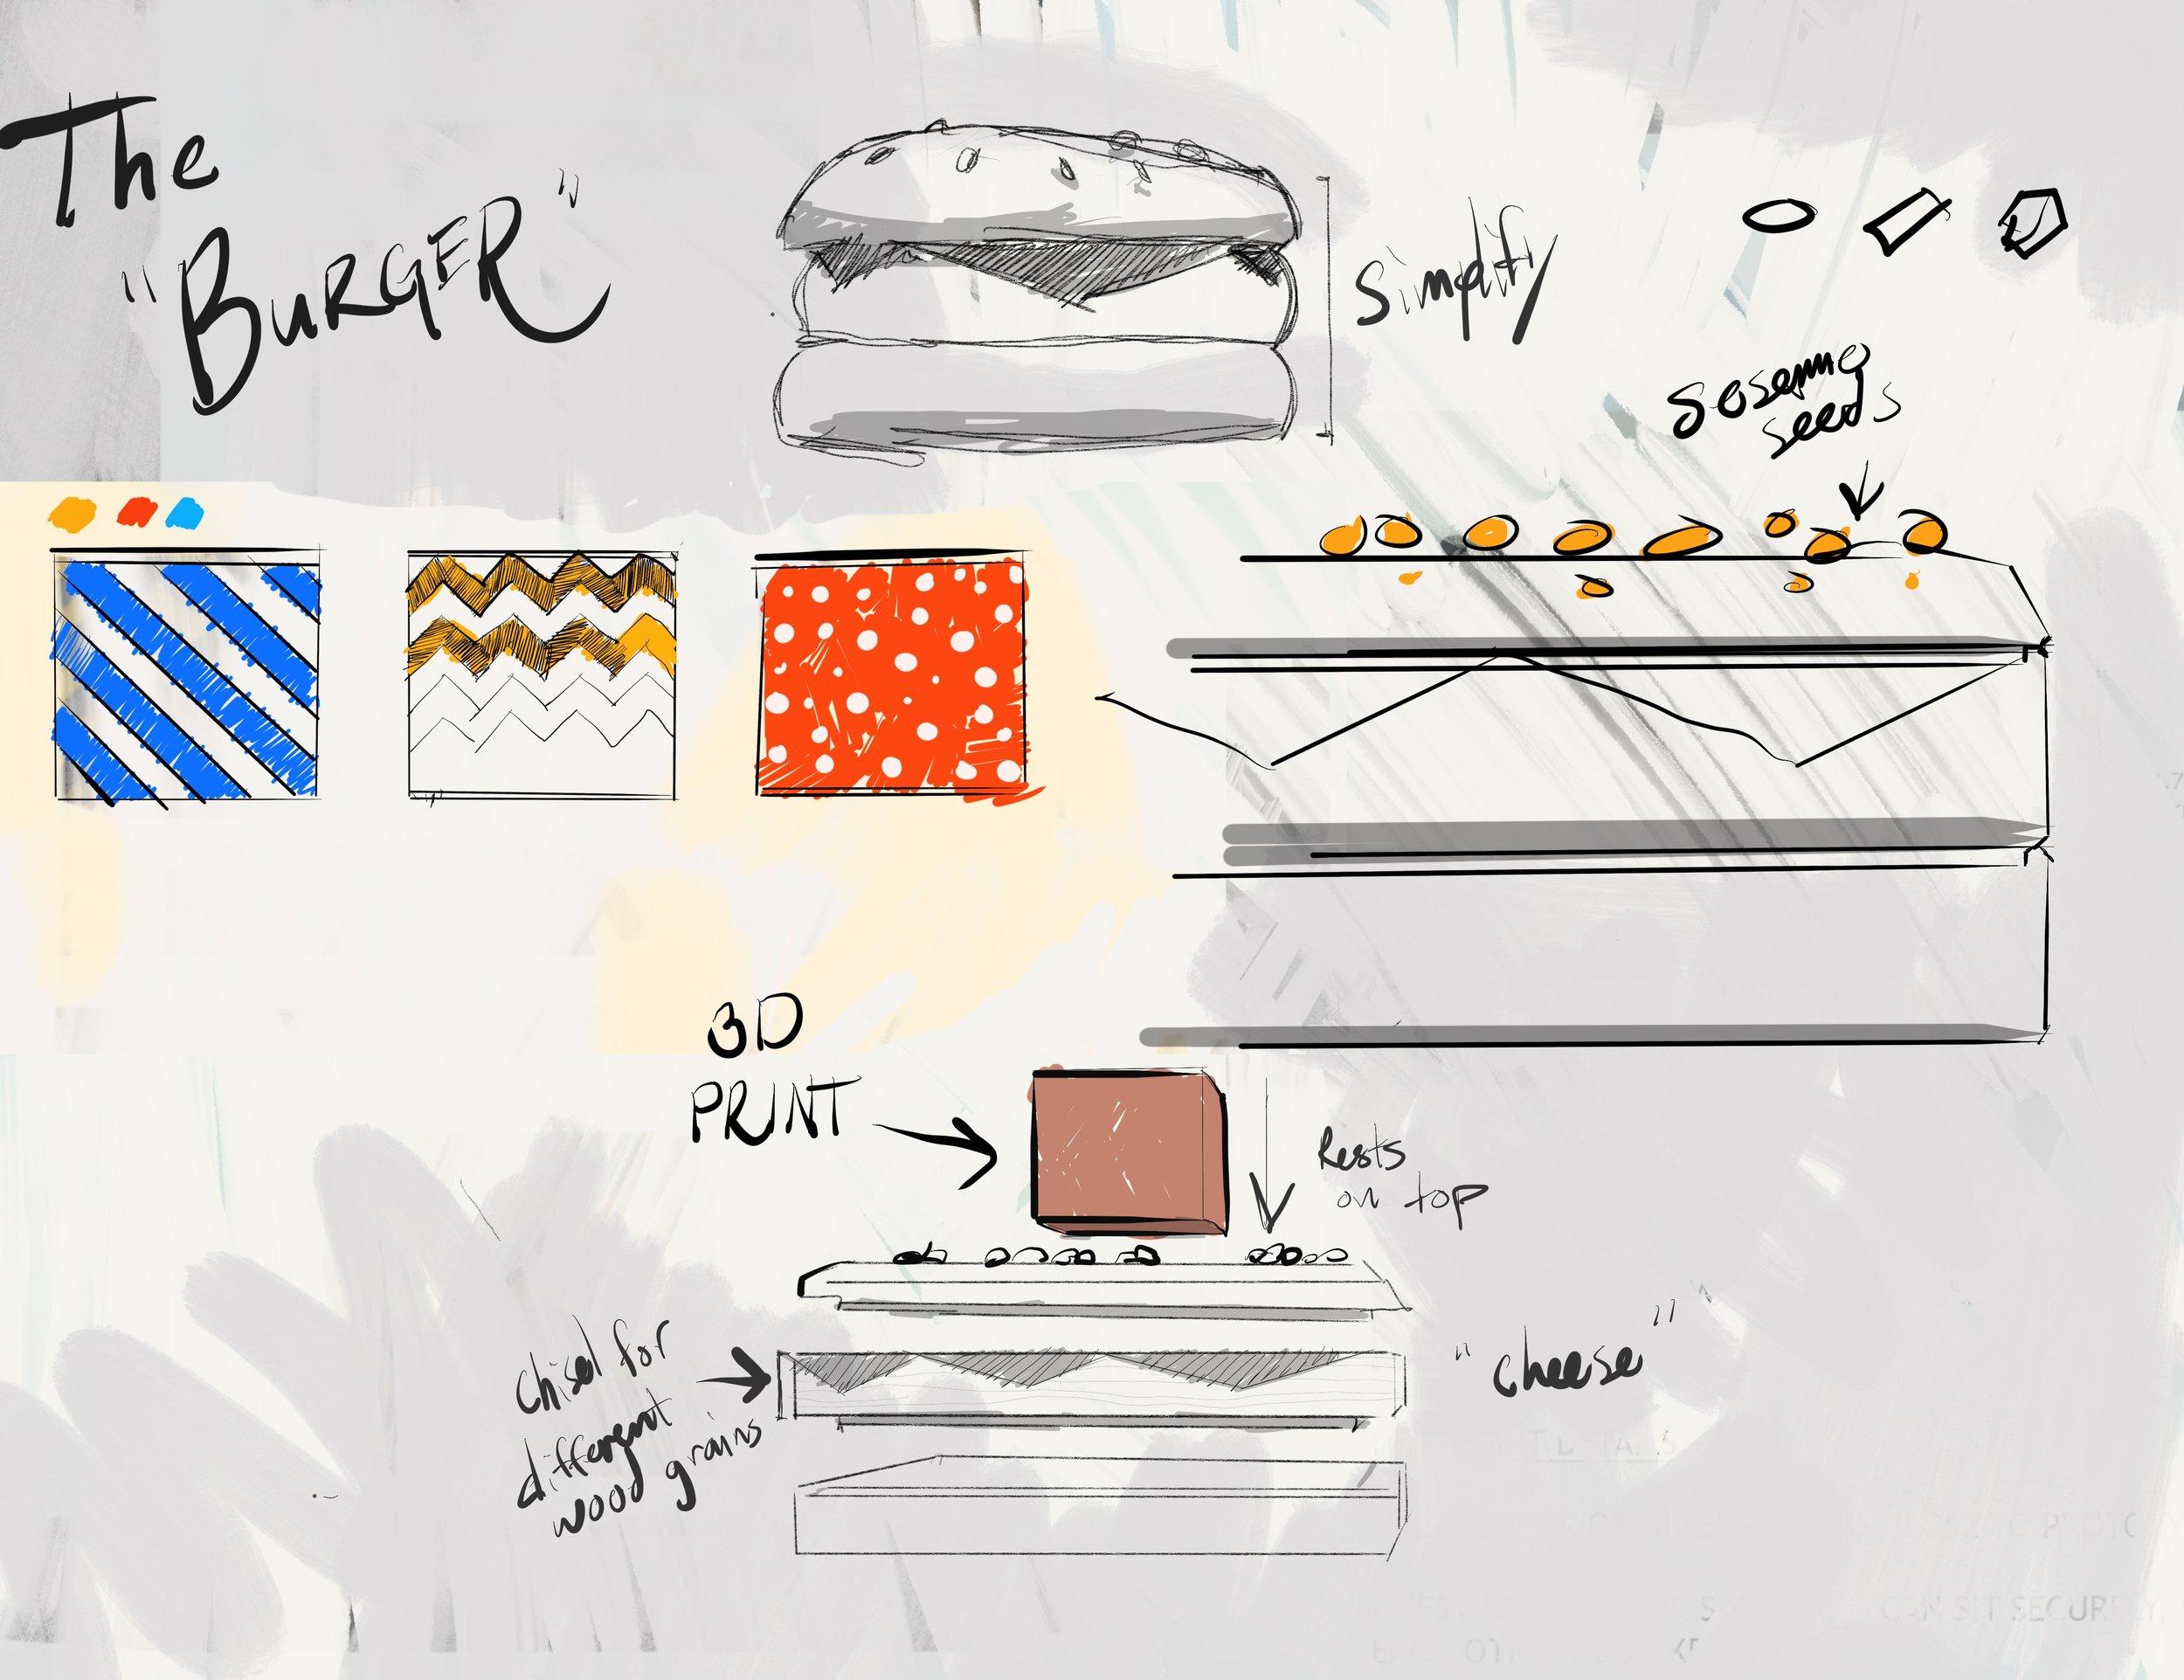 burger_stack_layout (1).jpg